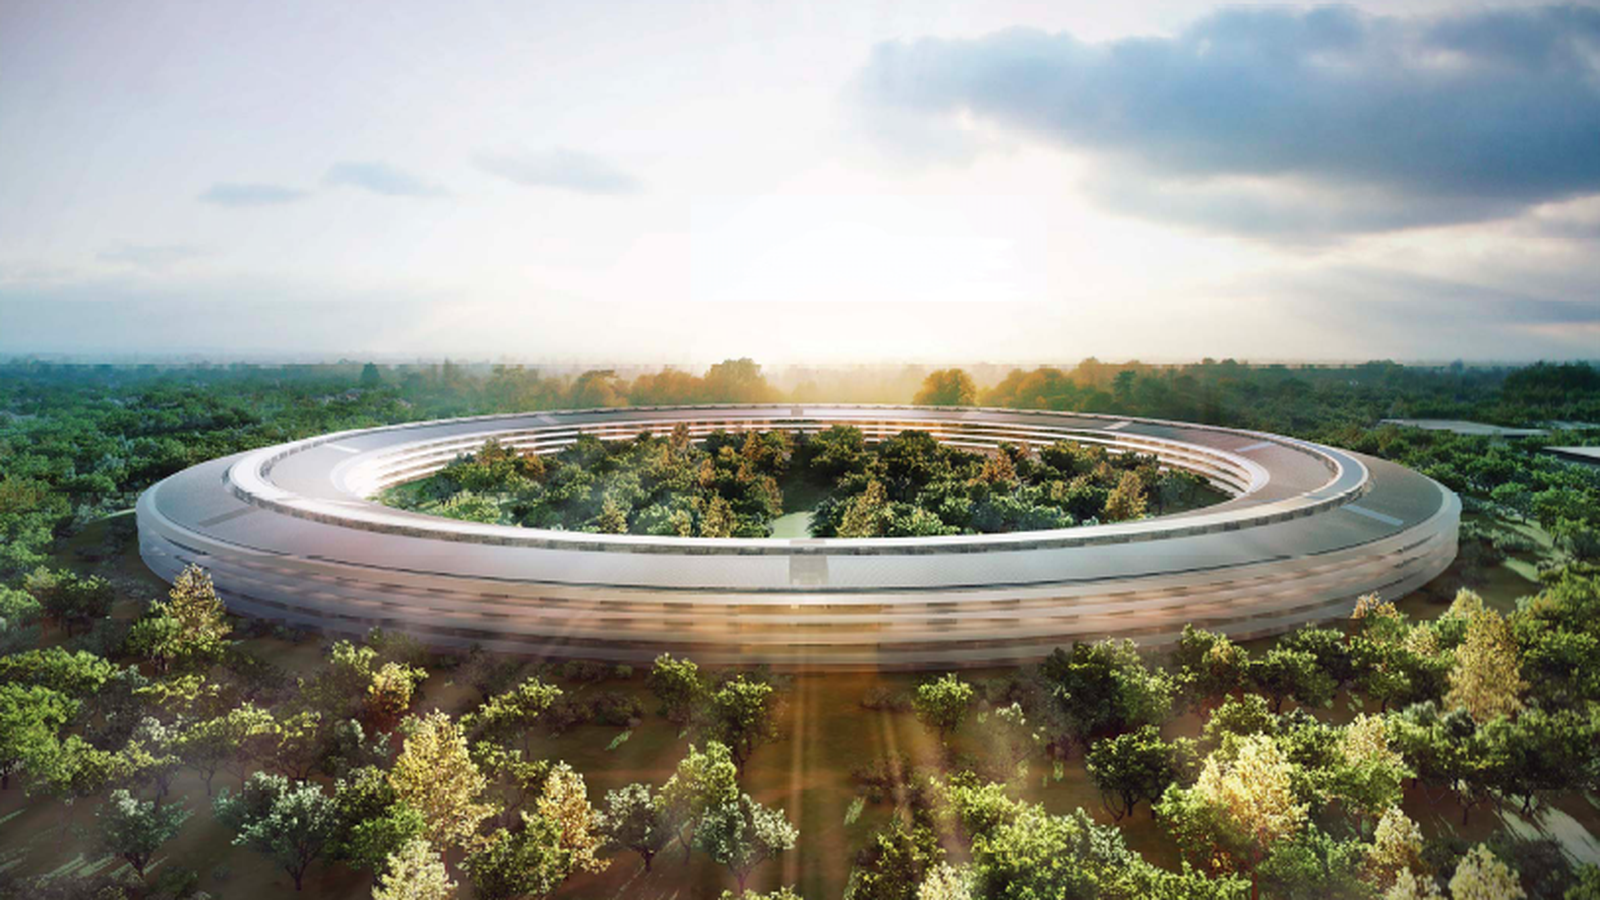 Опубликовано новое видео постройки Apple Campus 2